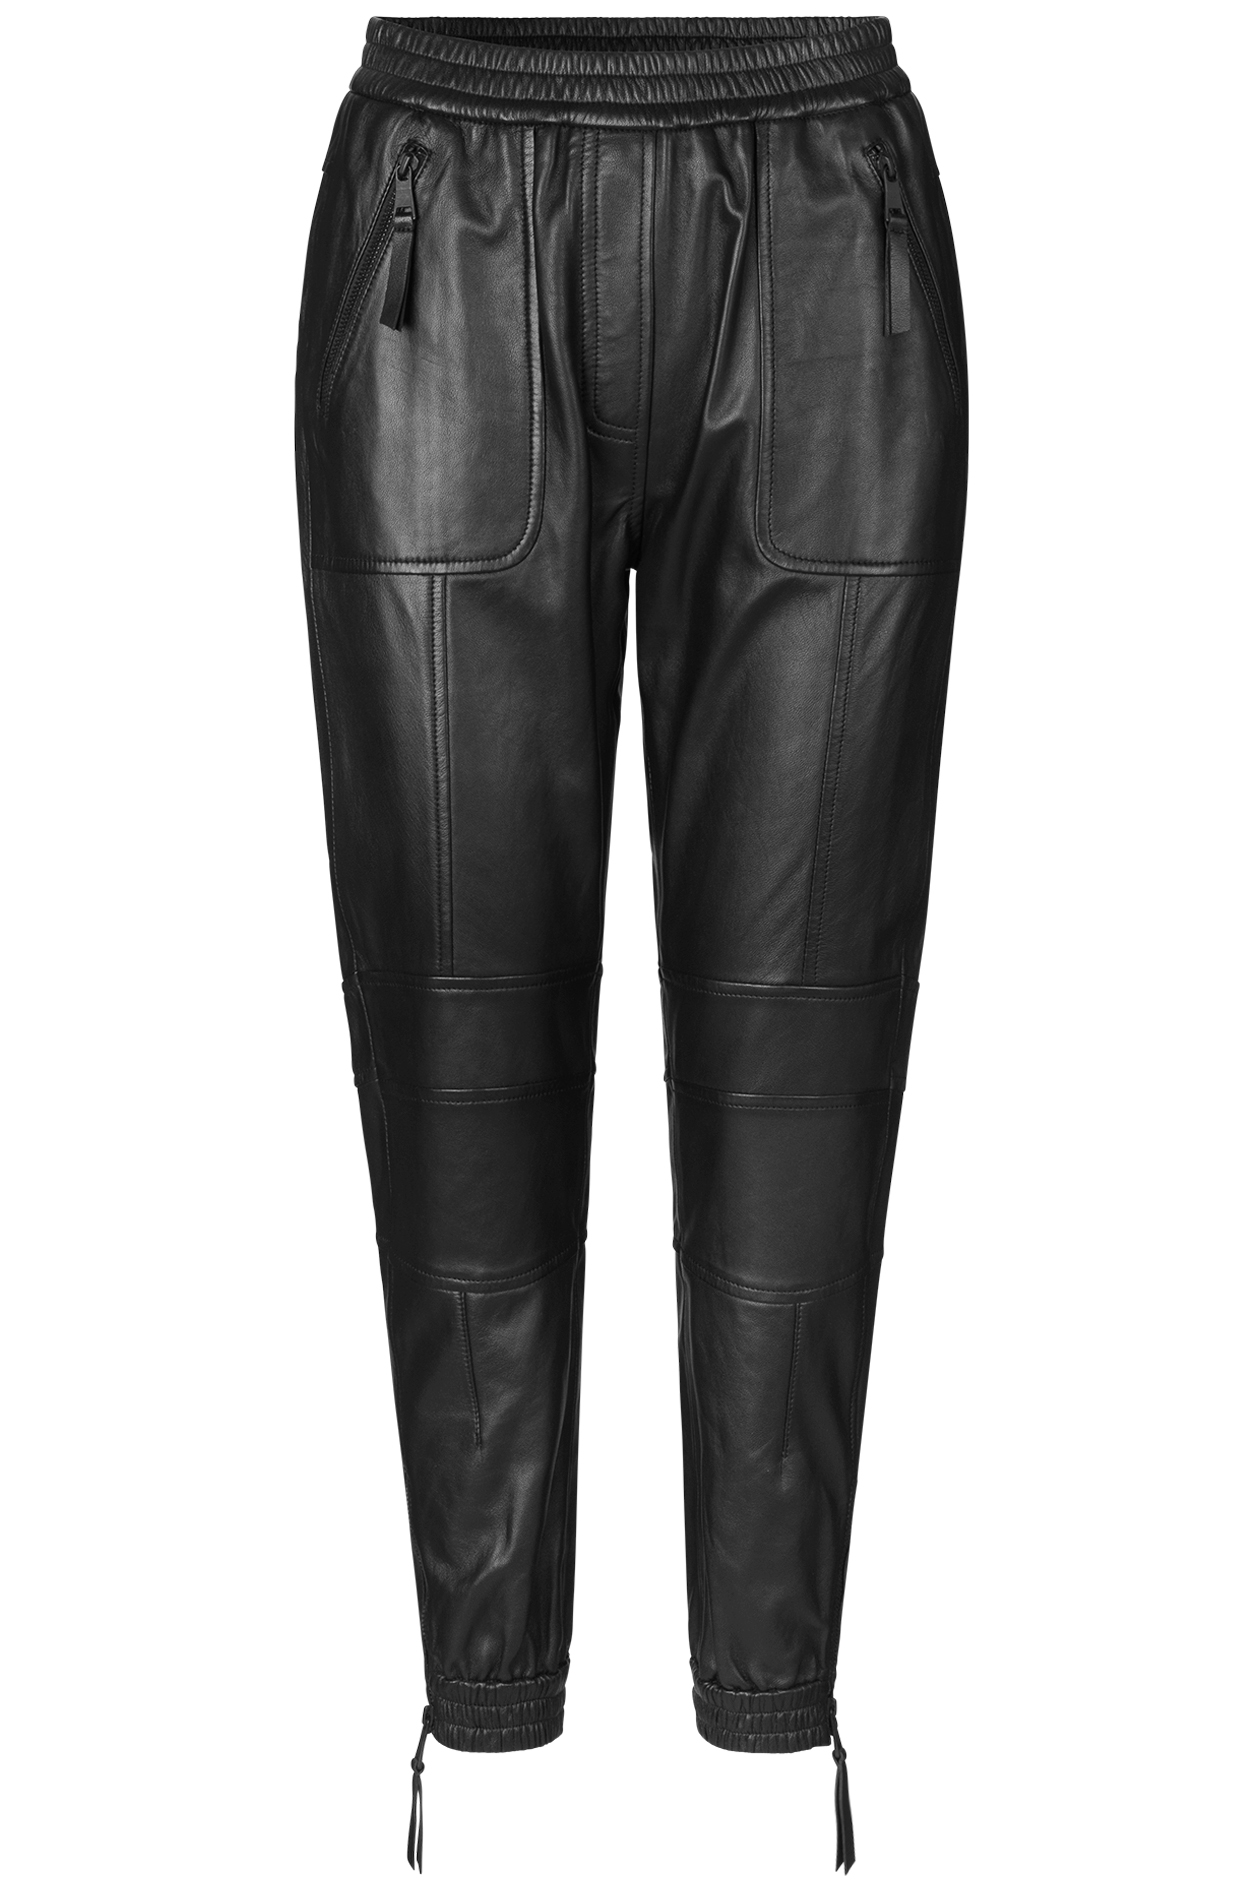 Munthe Orwy bukser